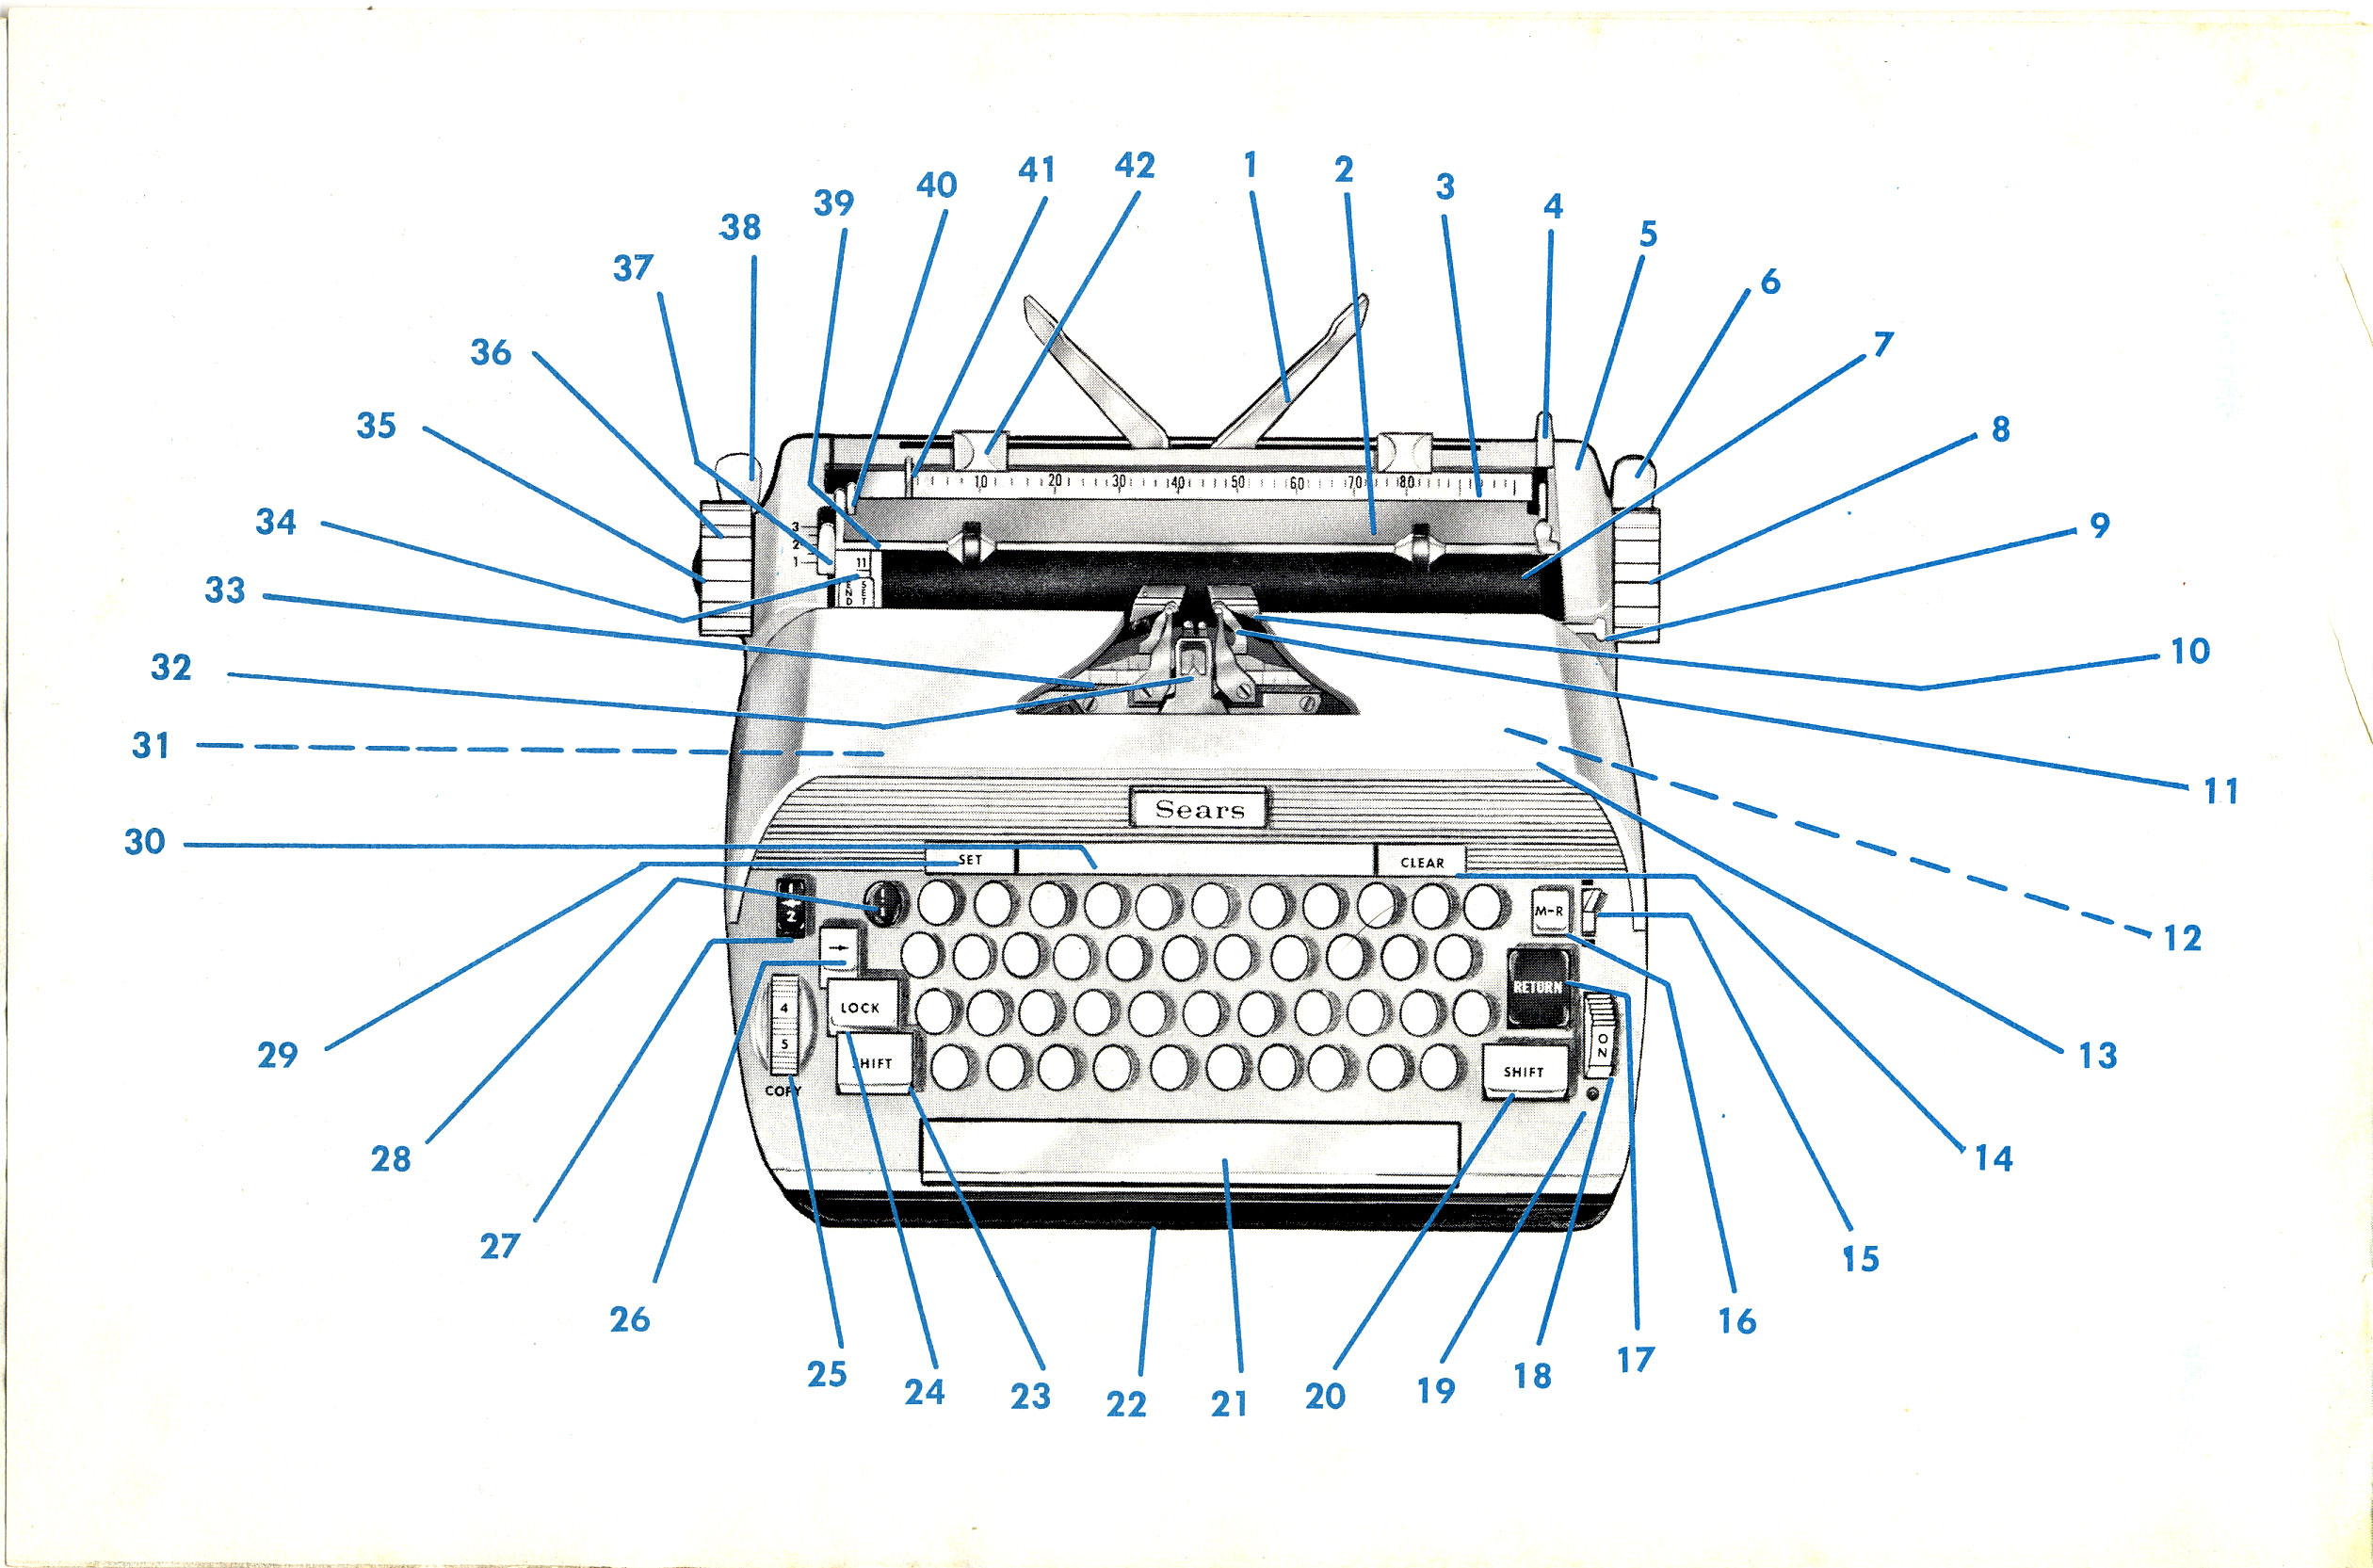 Sears Celebrity Electric Celebrity Power 12 Typewriter Ribbon FREE SHIPPING